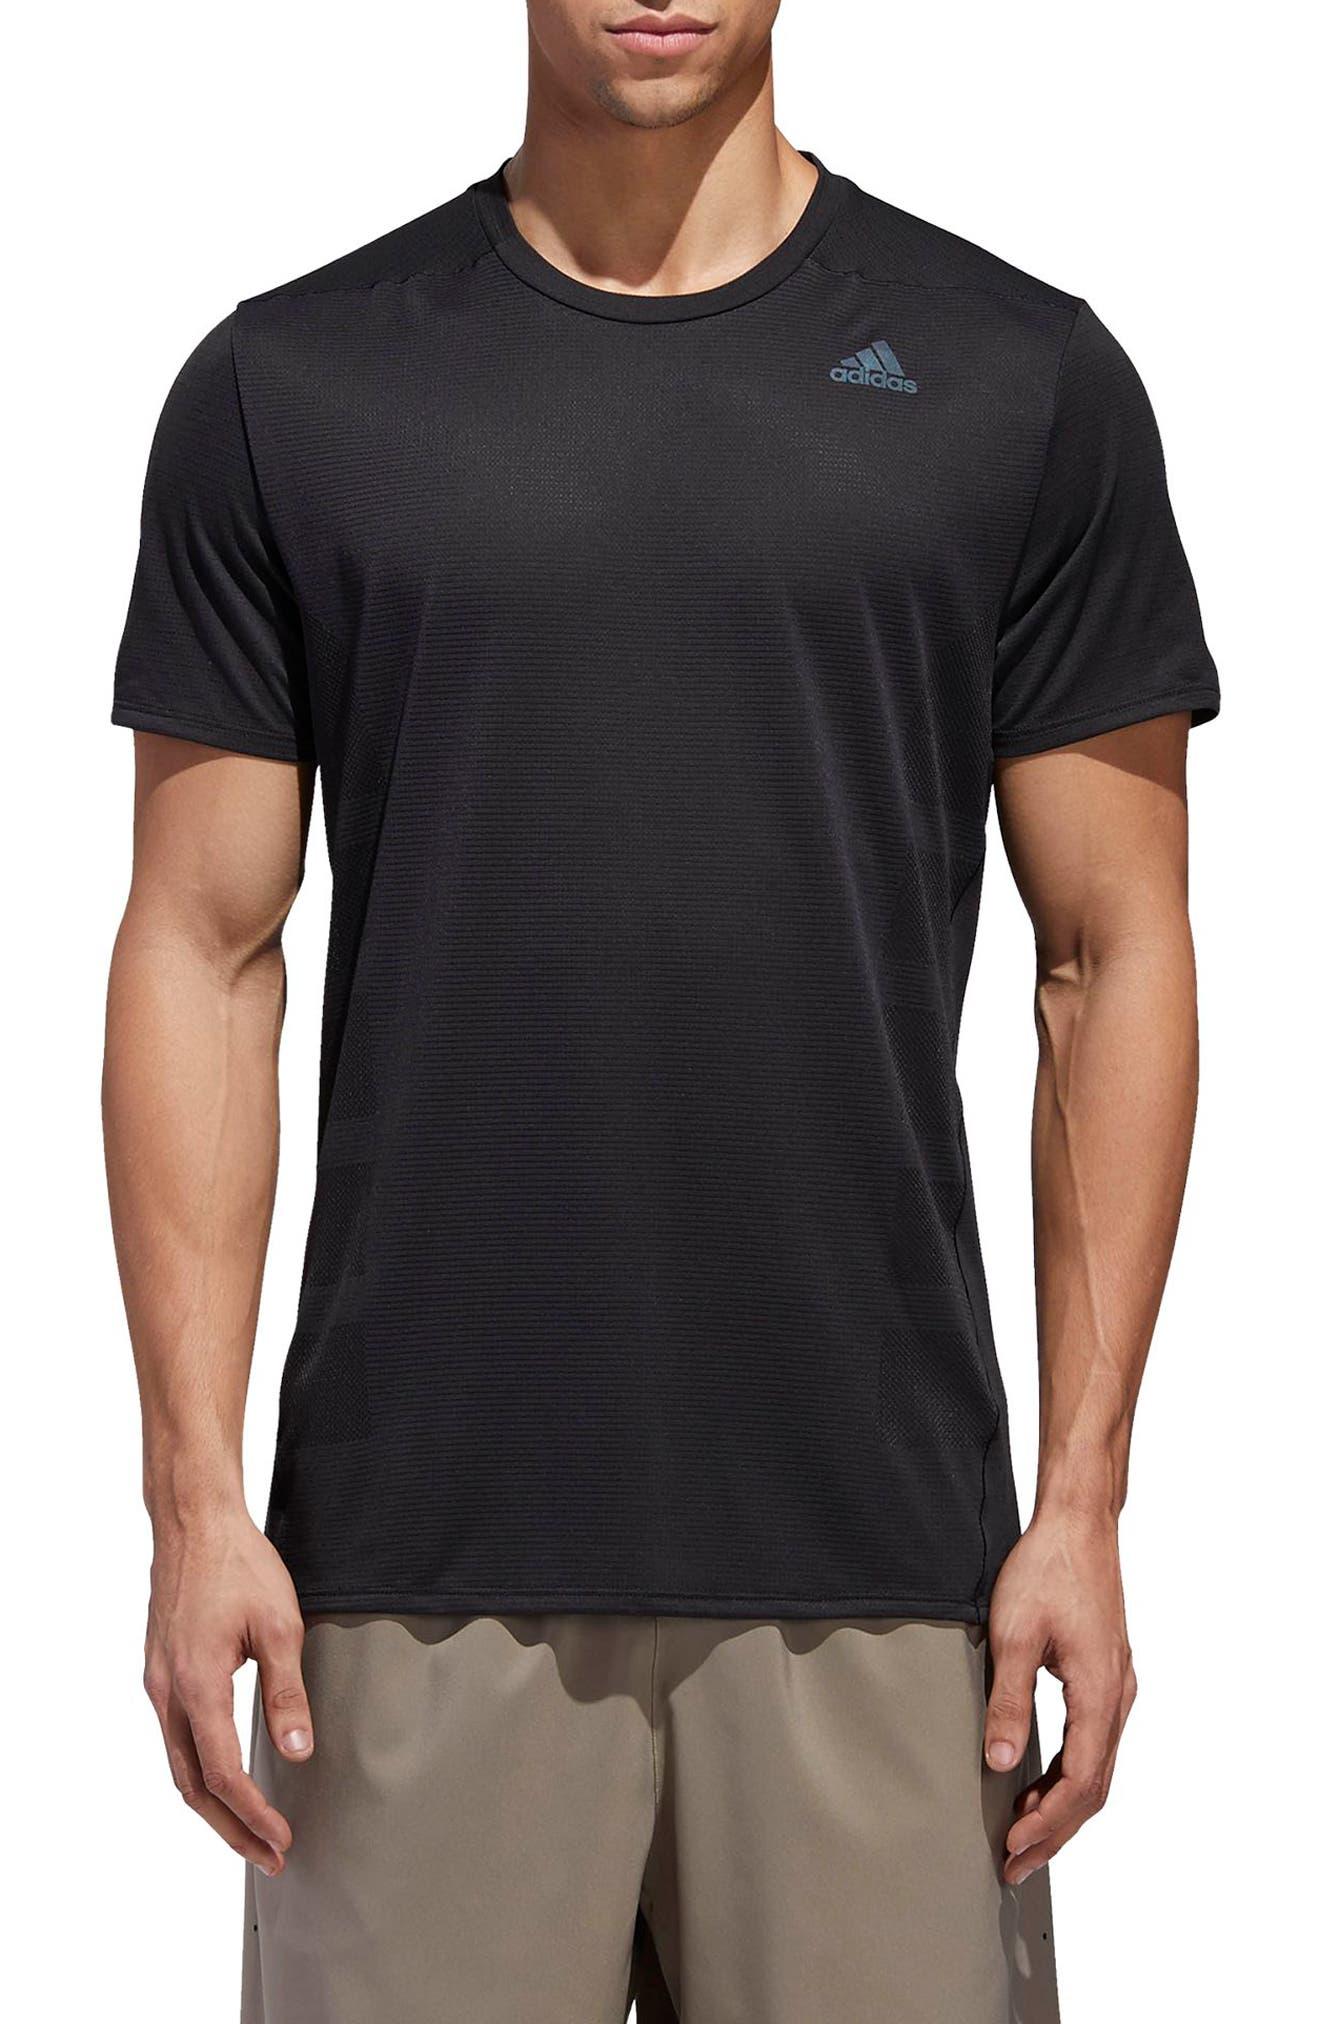 Supernova Regular Fit Short Sleeve Reflective Running T-Shirt,                             Main thumbnail 1, color,                             BLACK